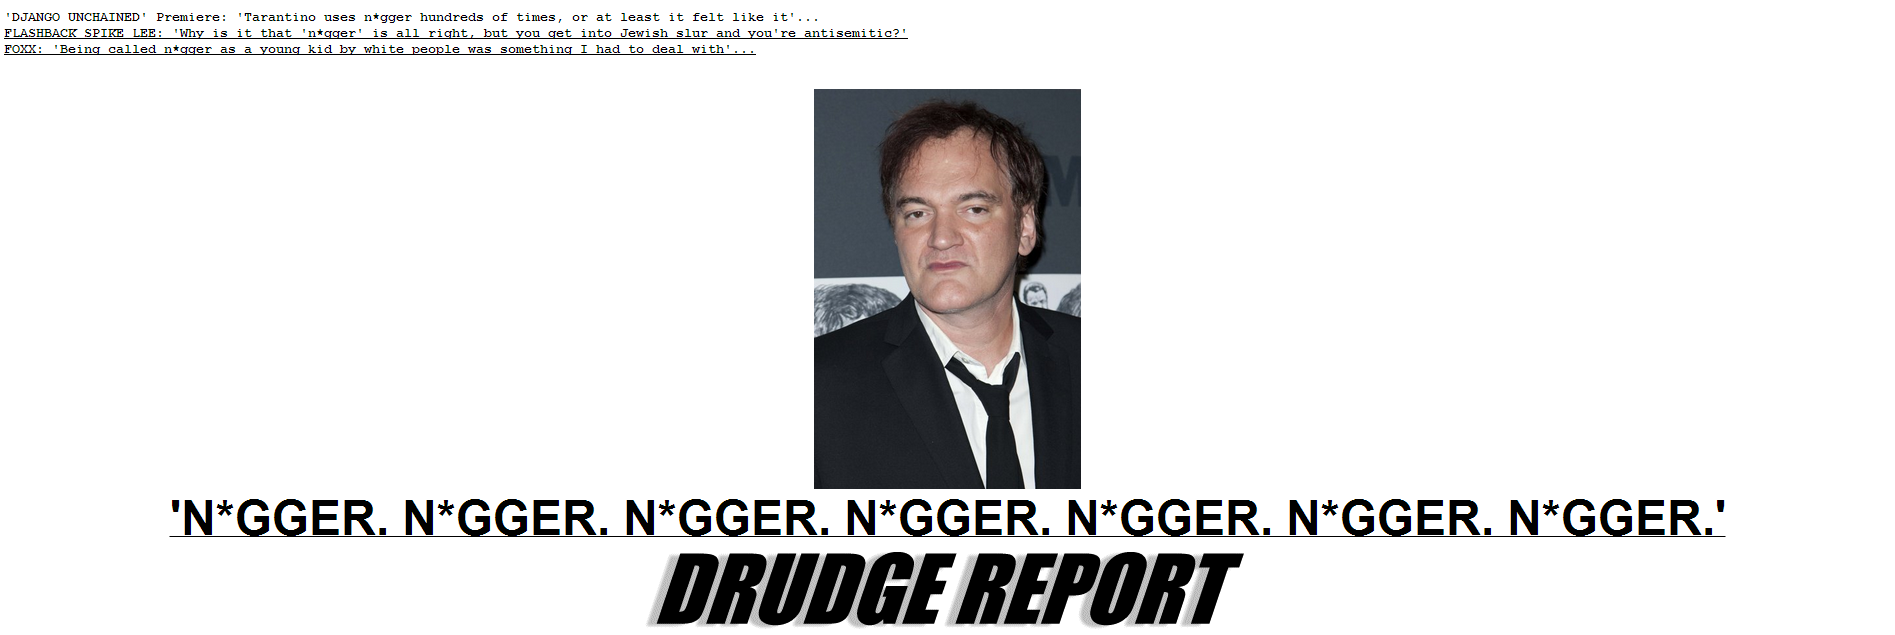 DRUDGE REPORT 2013®